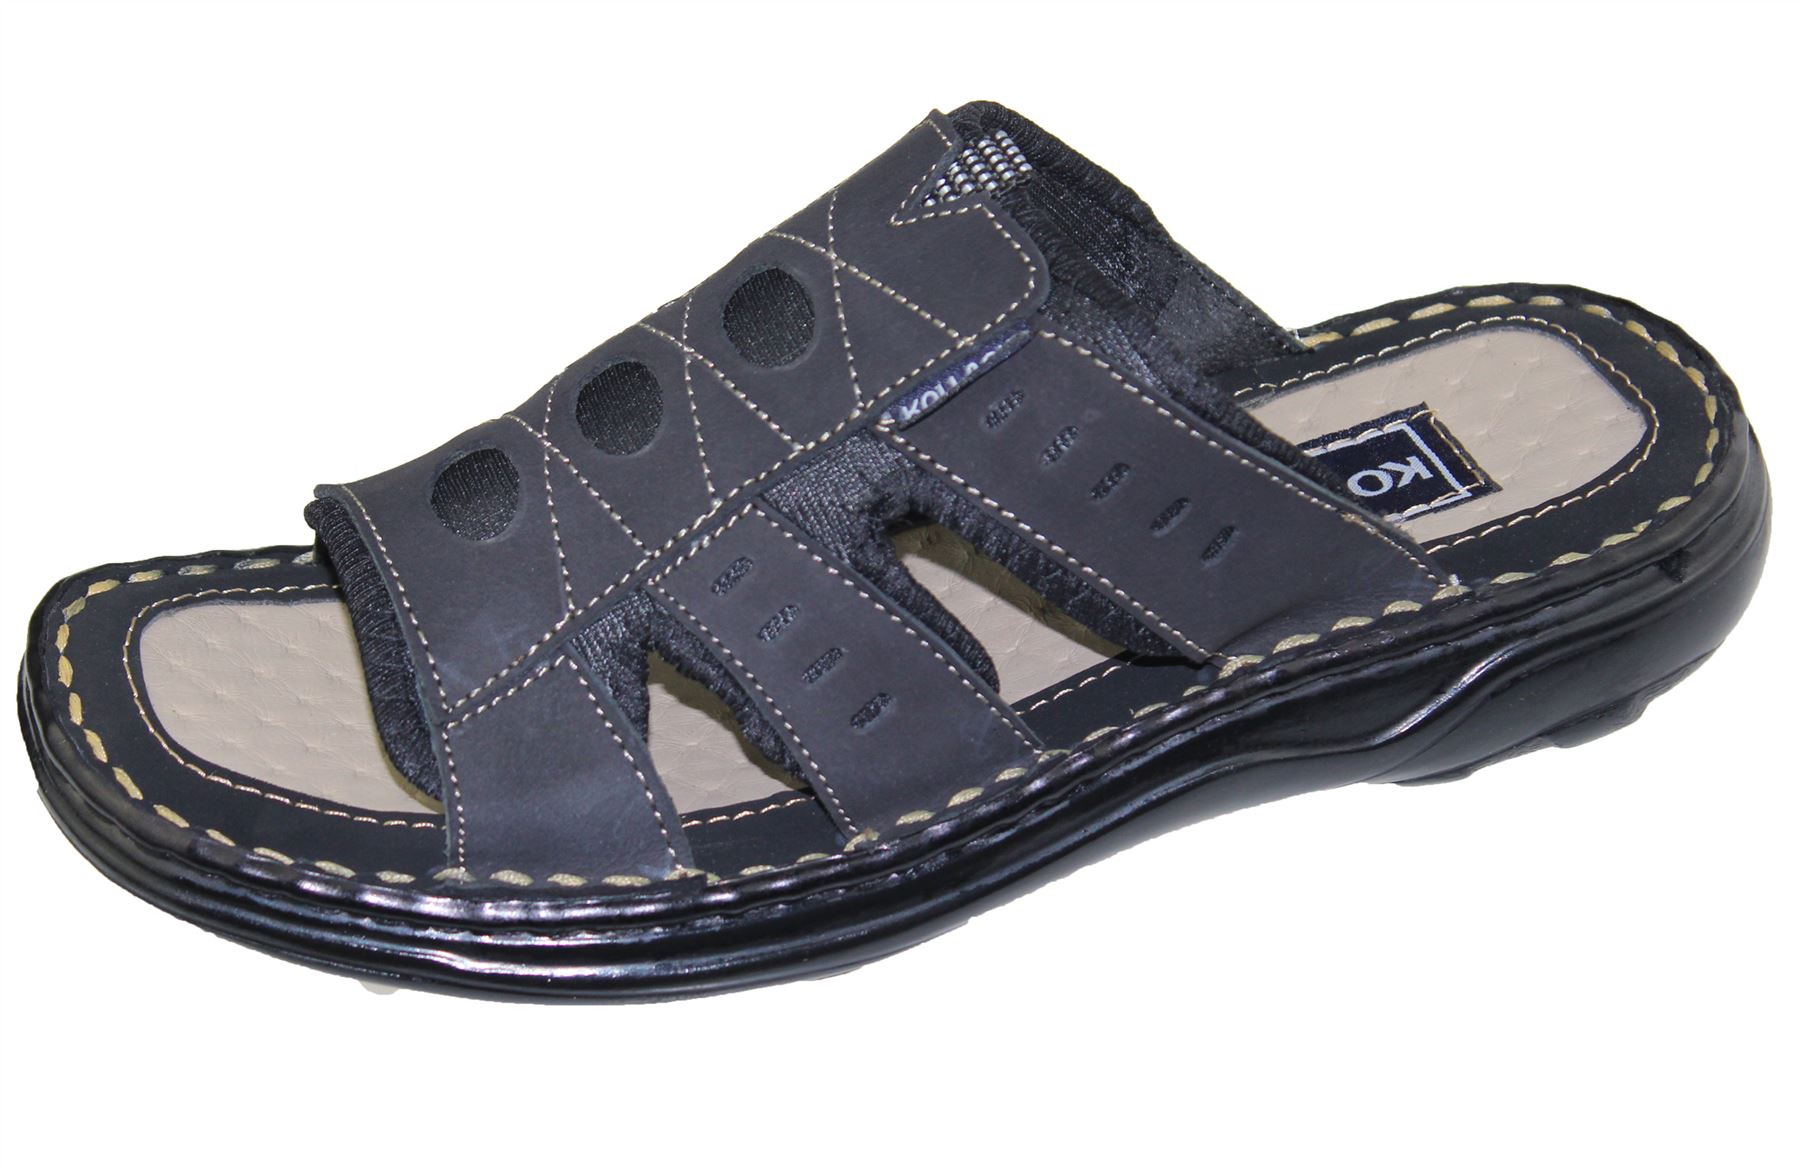 Mens-Slipper-Sandal-Sports-Beach-Buckle-Walking-Fashion-Summer-Casual-Shoes-Size miniatura 3